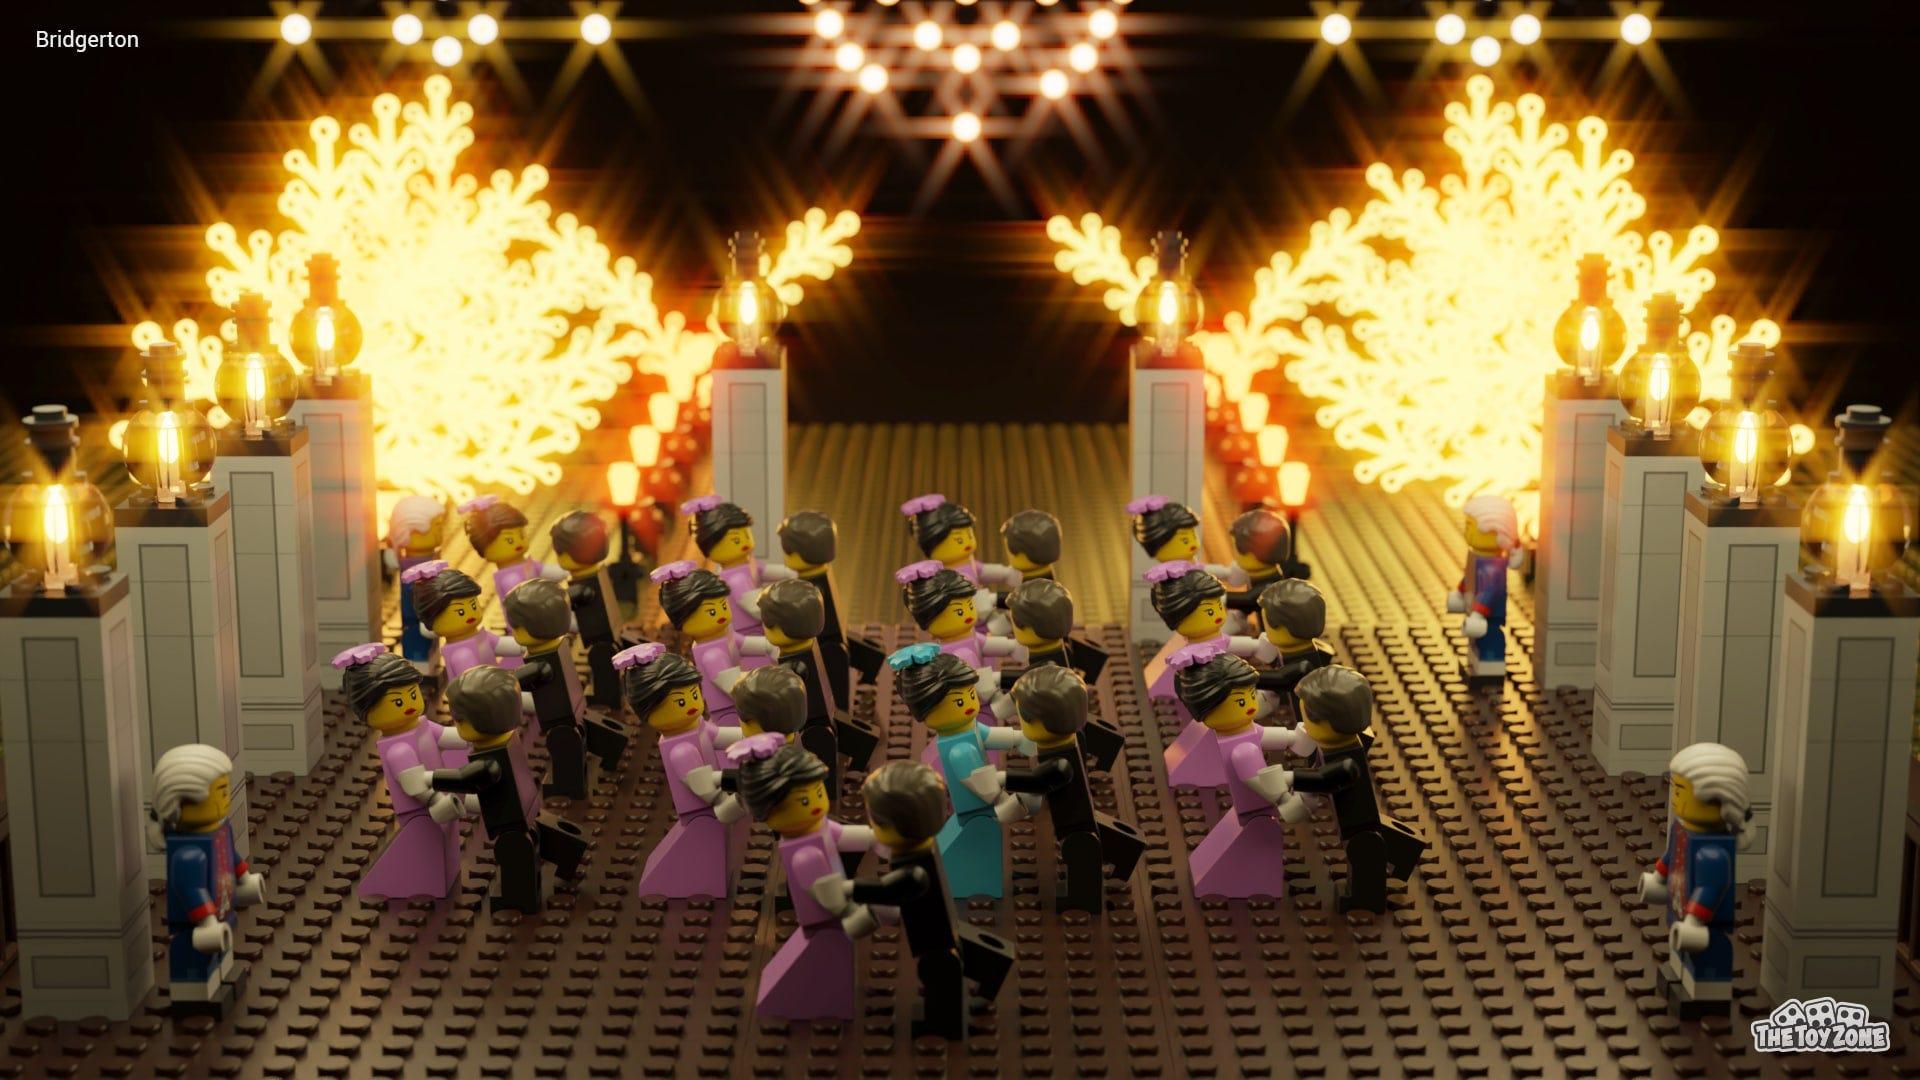 "LEGO Minifigures dancing in a famous scene from ""Bridgerton."""